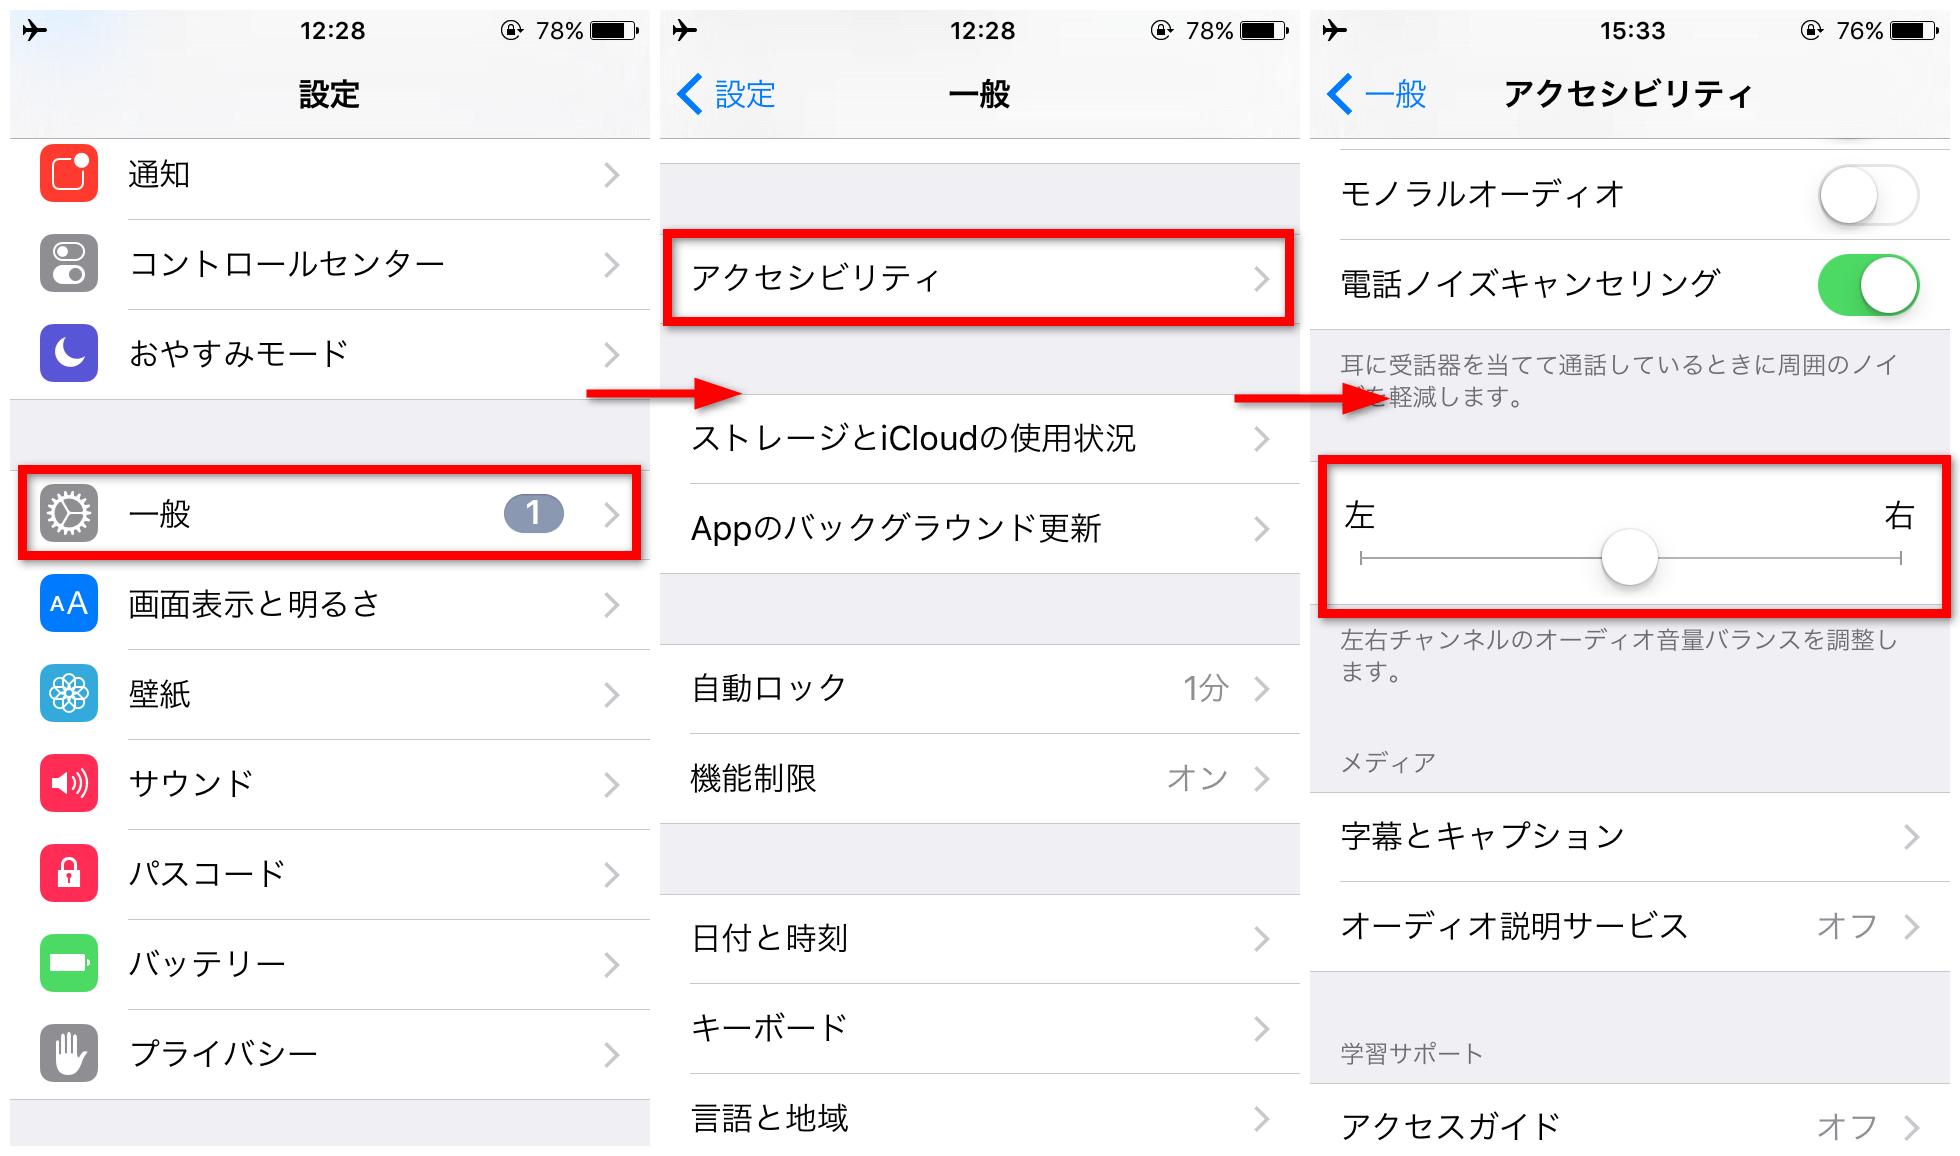 iPhoneでオーディオバランスを調整する手順